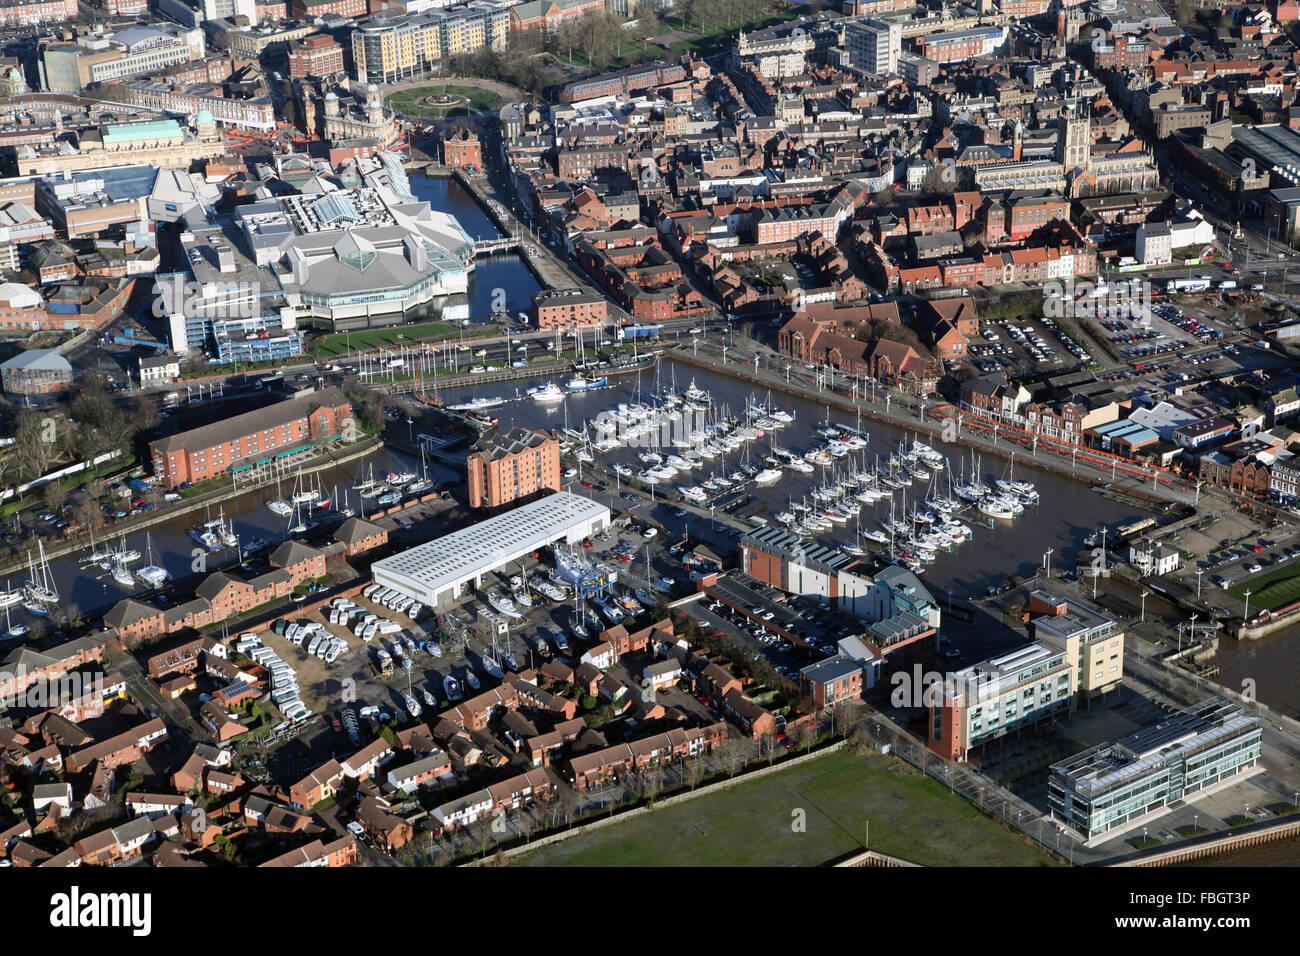 aerial view of Hull Marina and Princess Quay Shopping Centre, UK - Stock Image